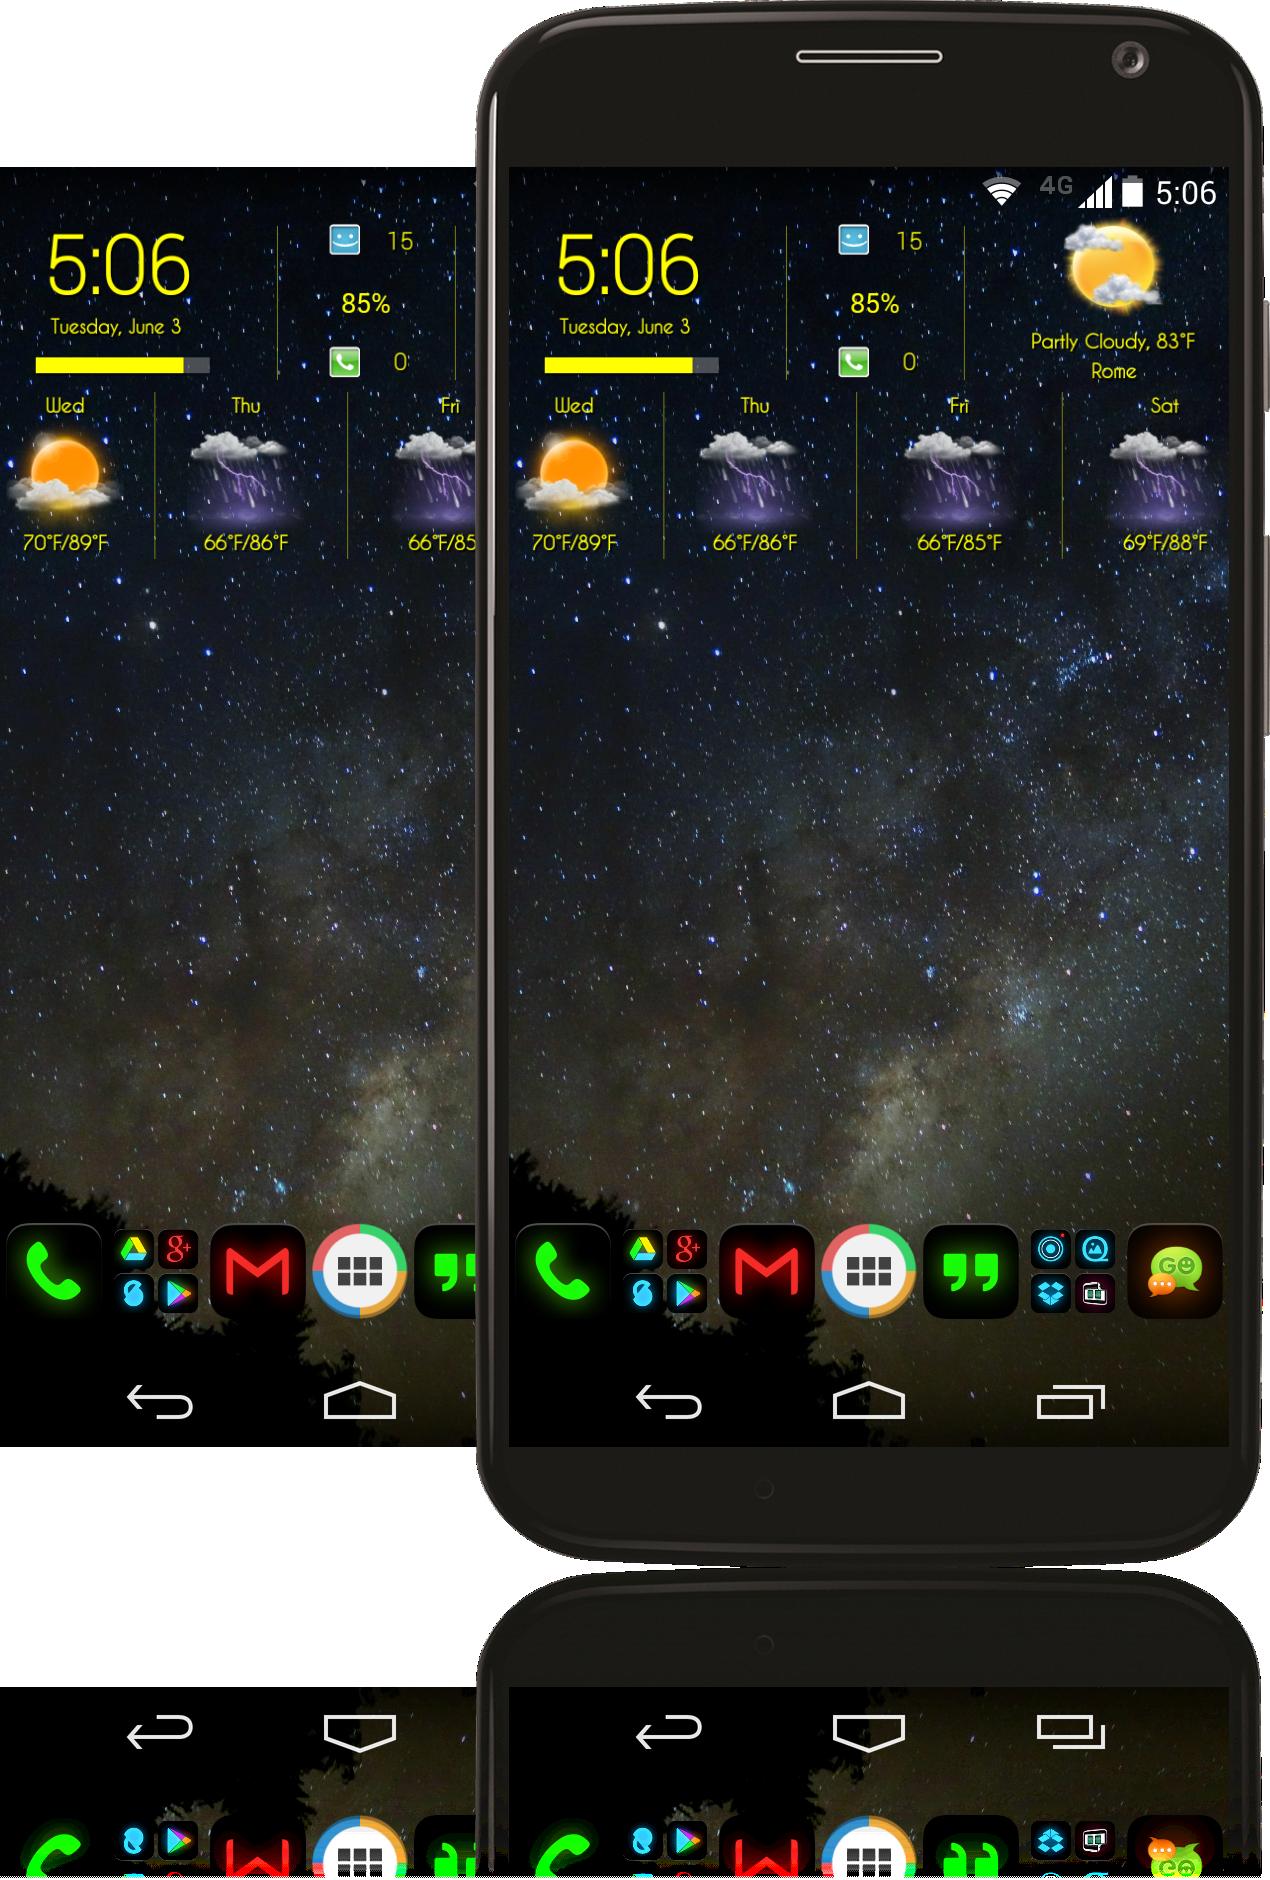 Neon Glow Screenshot Image